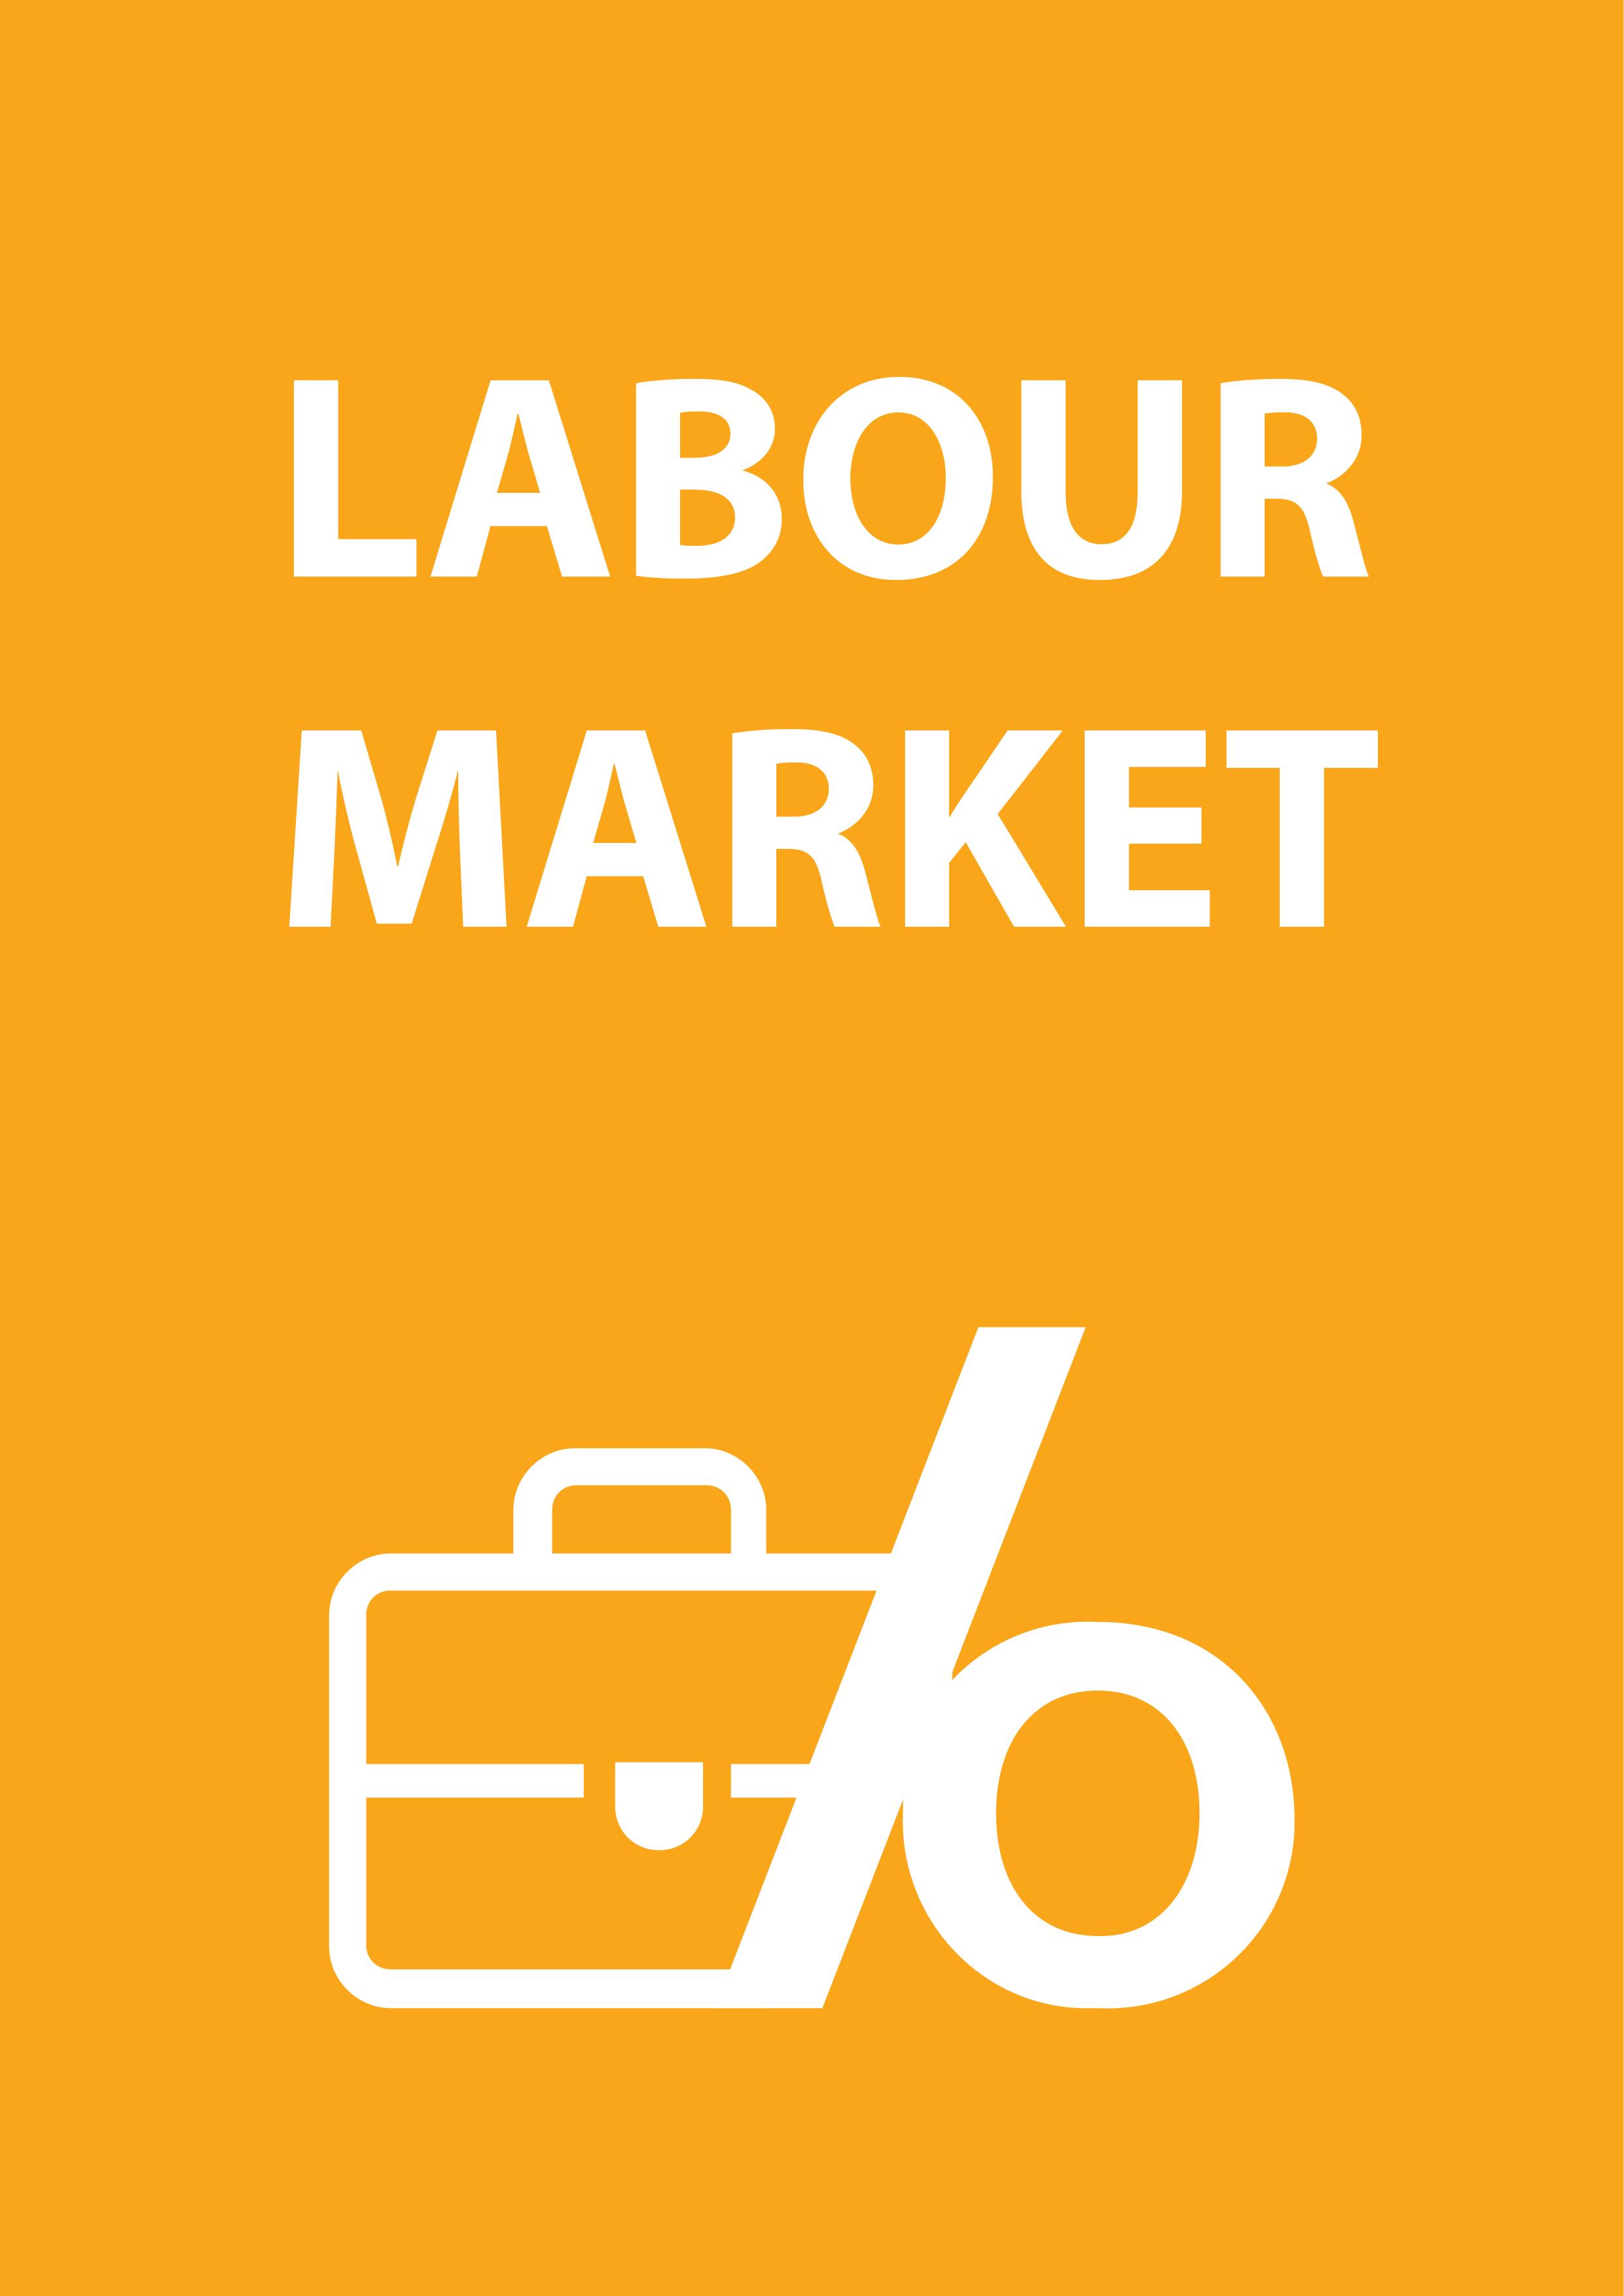 Statistics 4 beginners: Labour Market